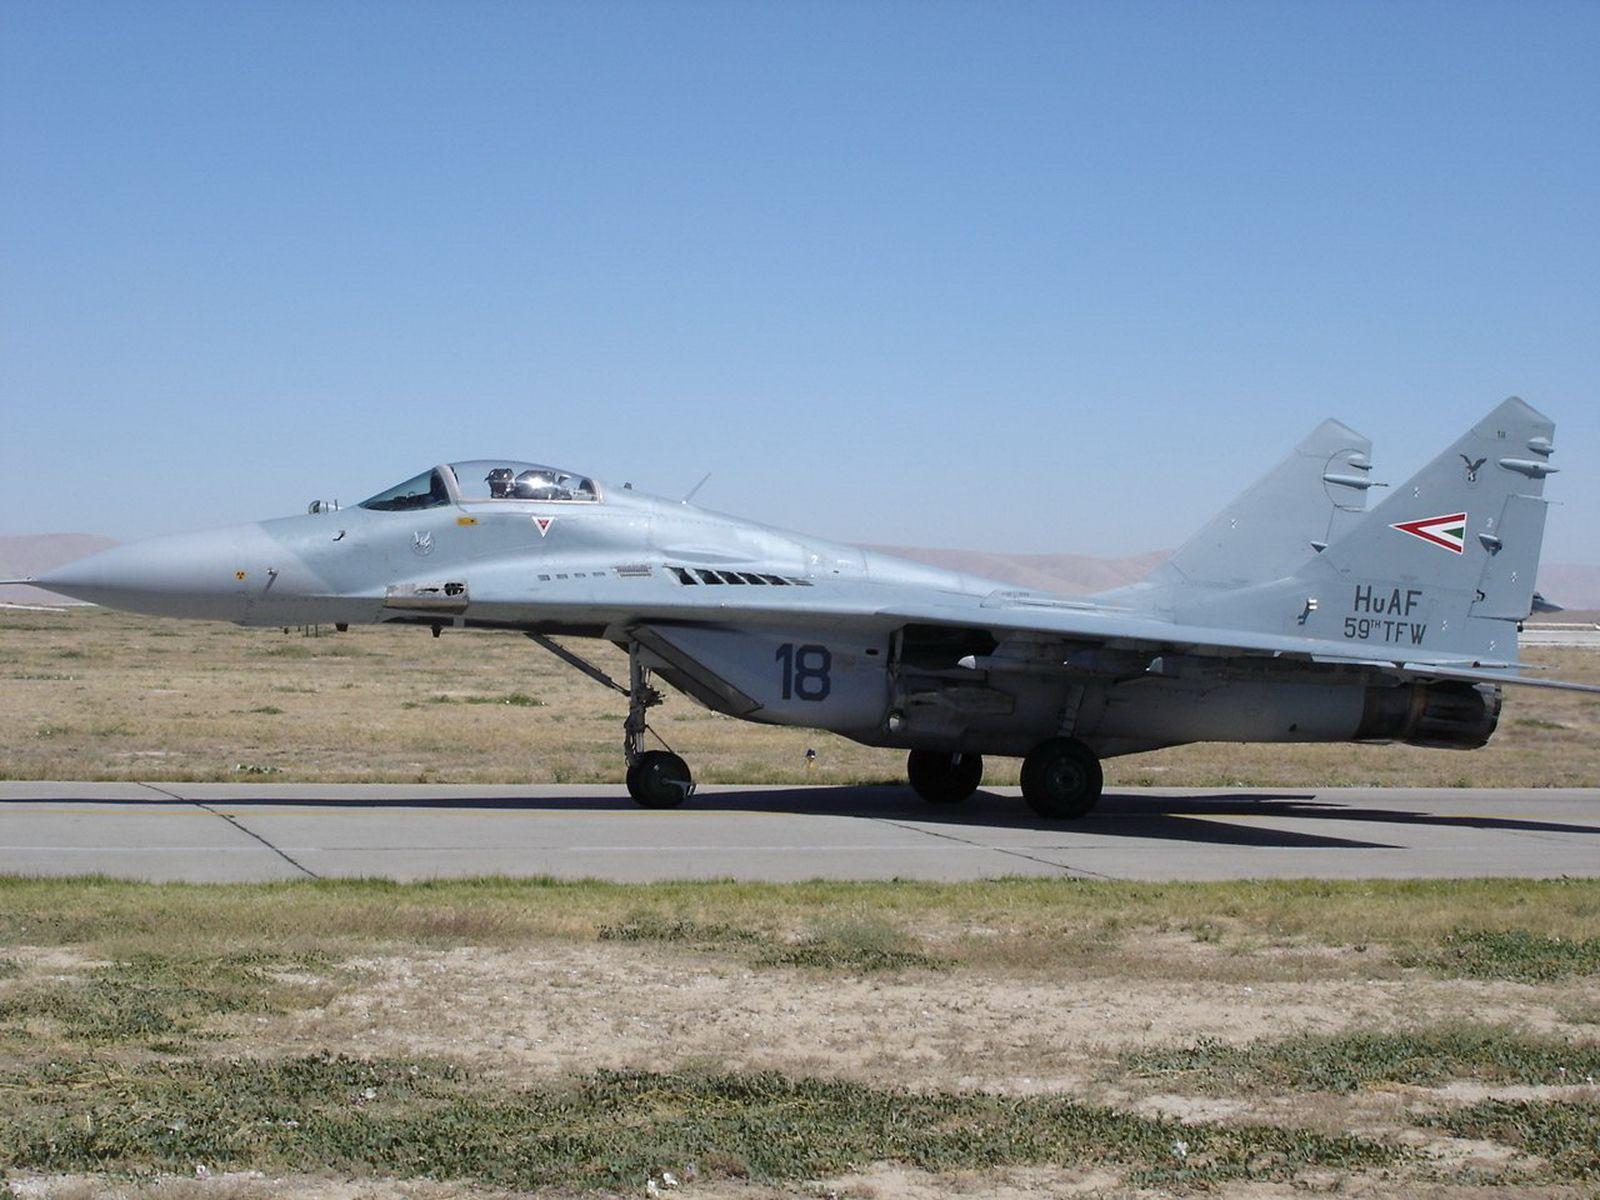 MiG-29 – WalkAround | Aircraft | Fighter jets, Aircraft design, Aircraft